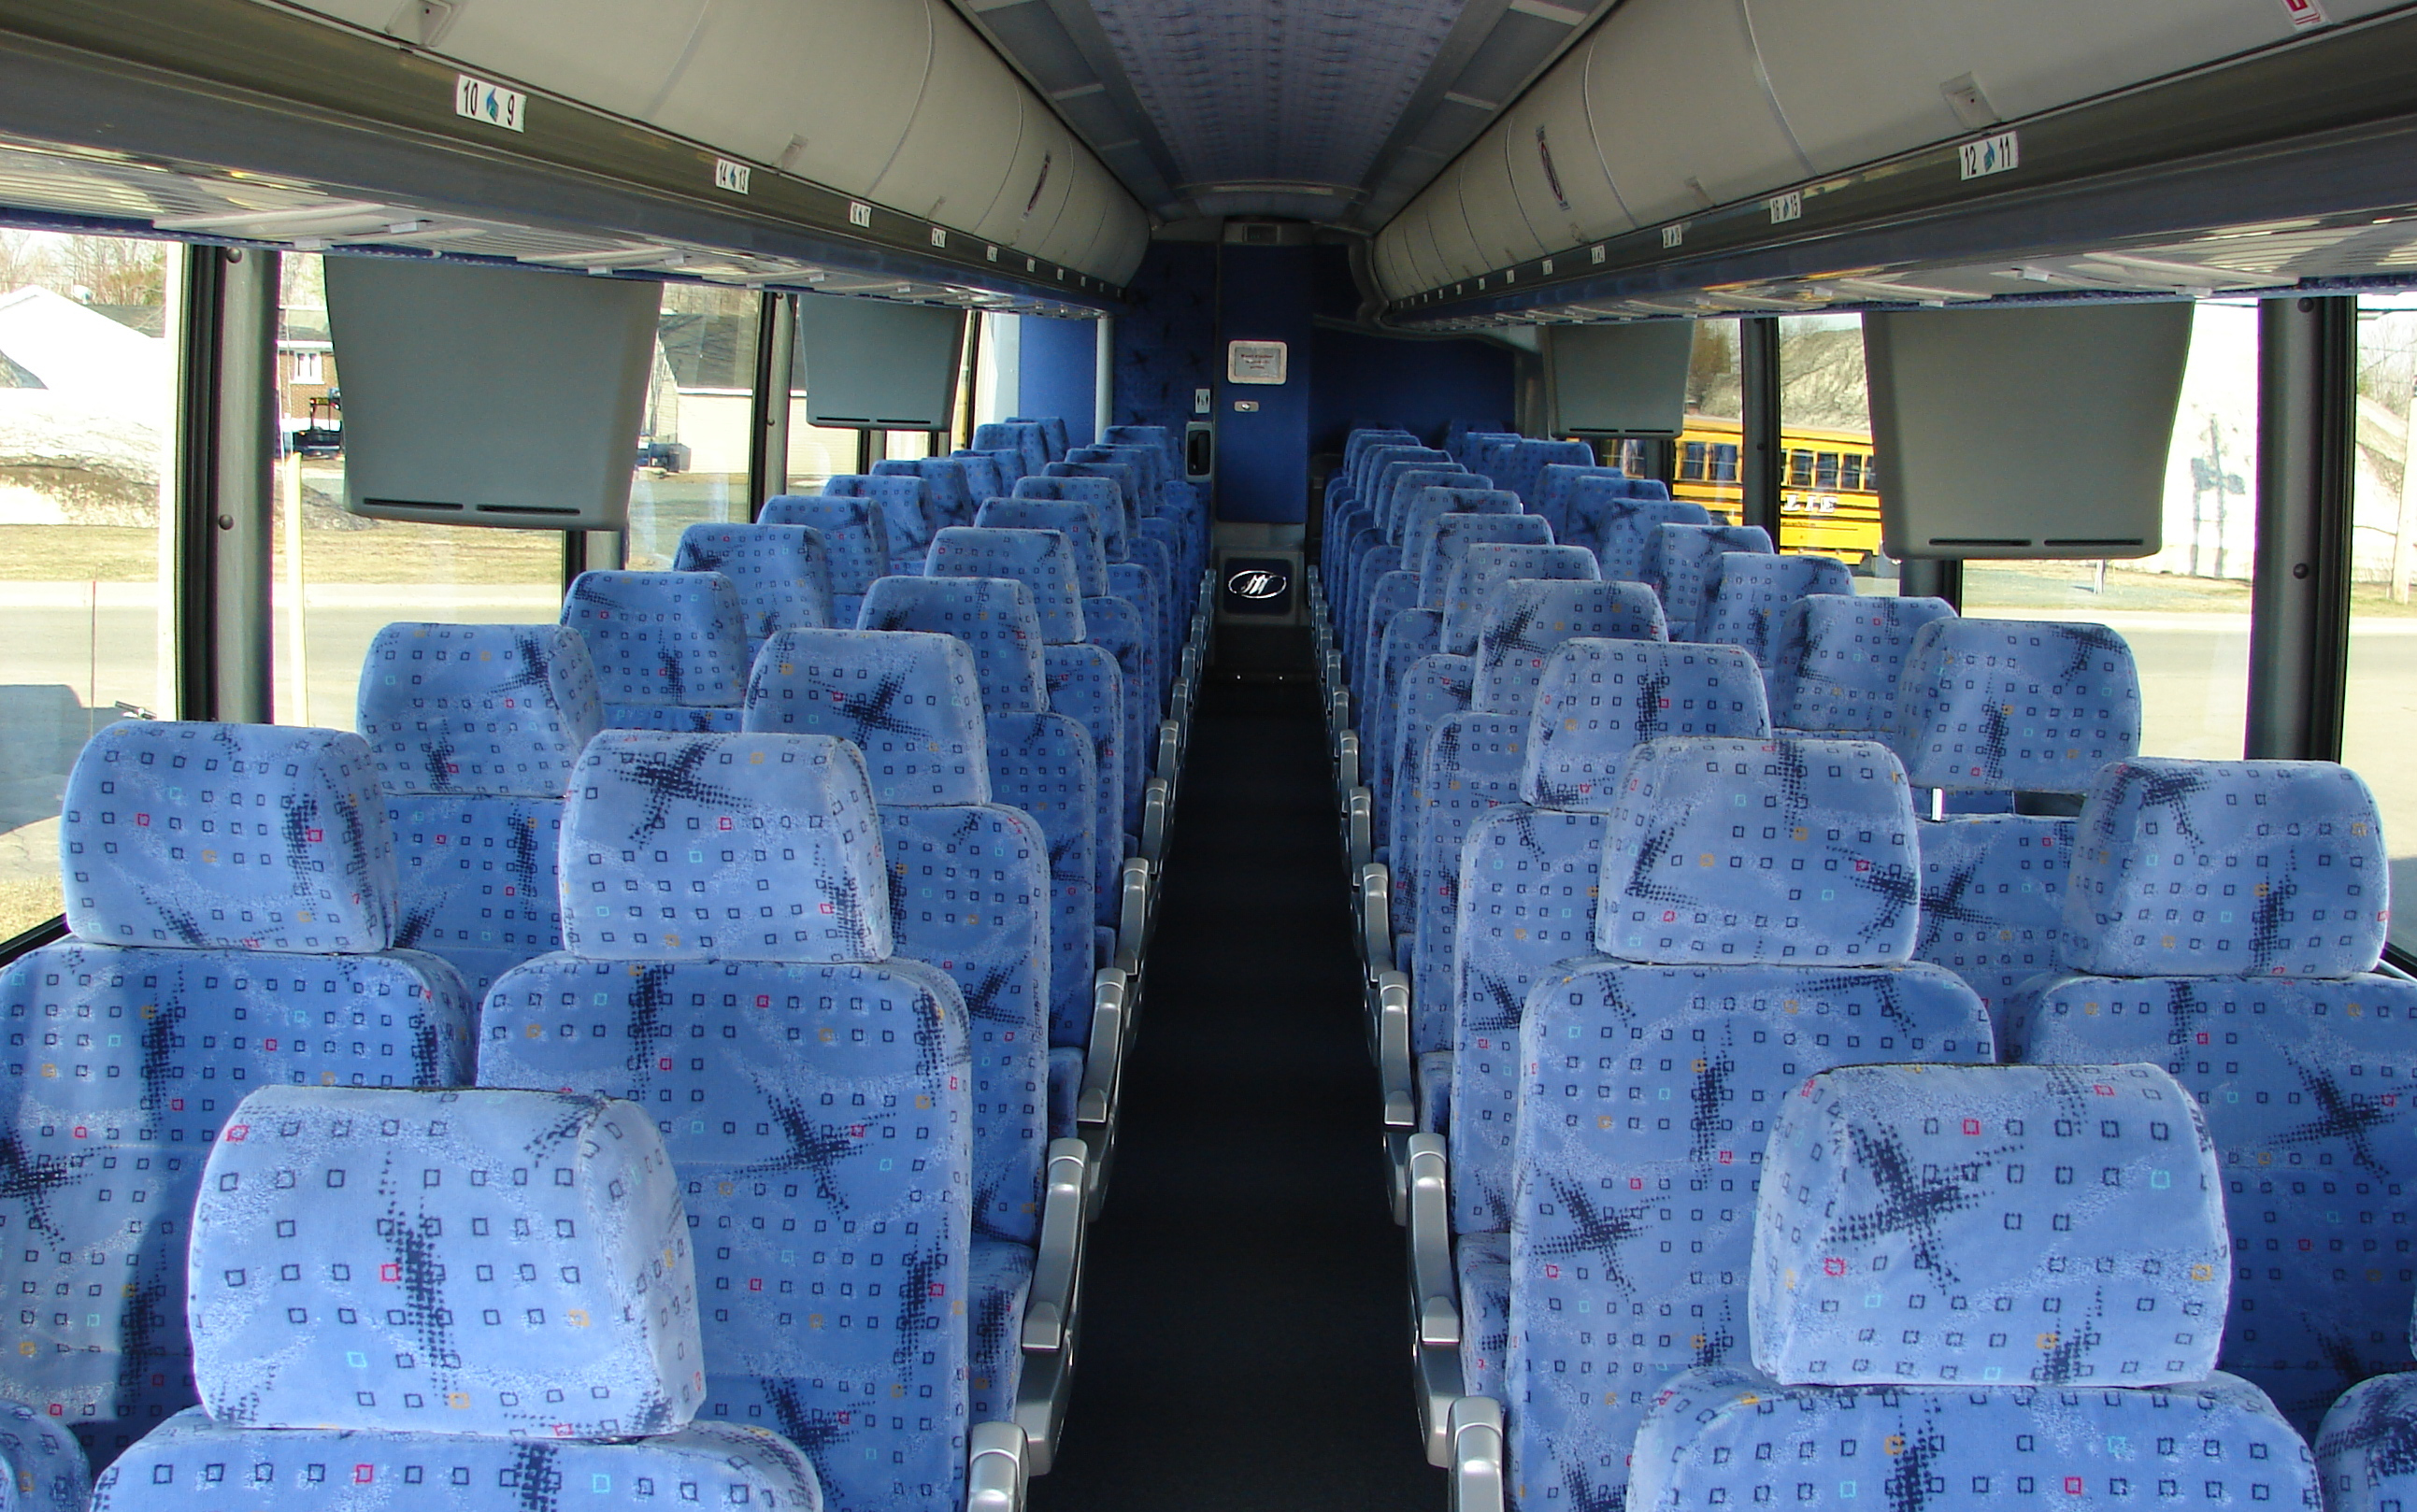 bussen en autocars reinigen